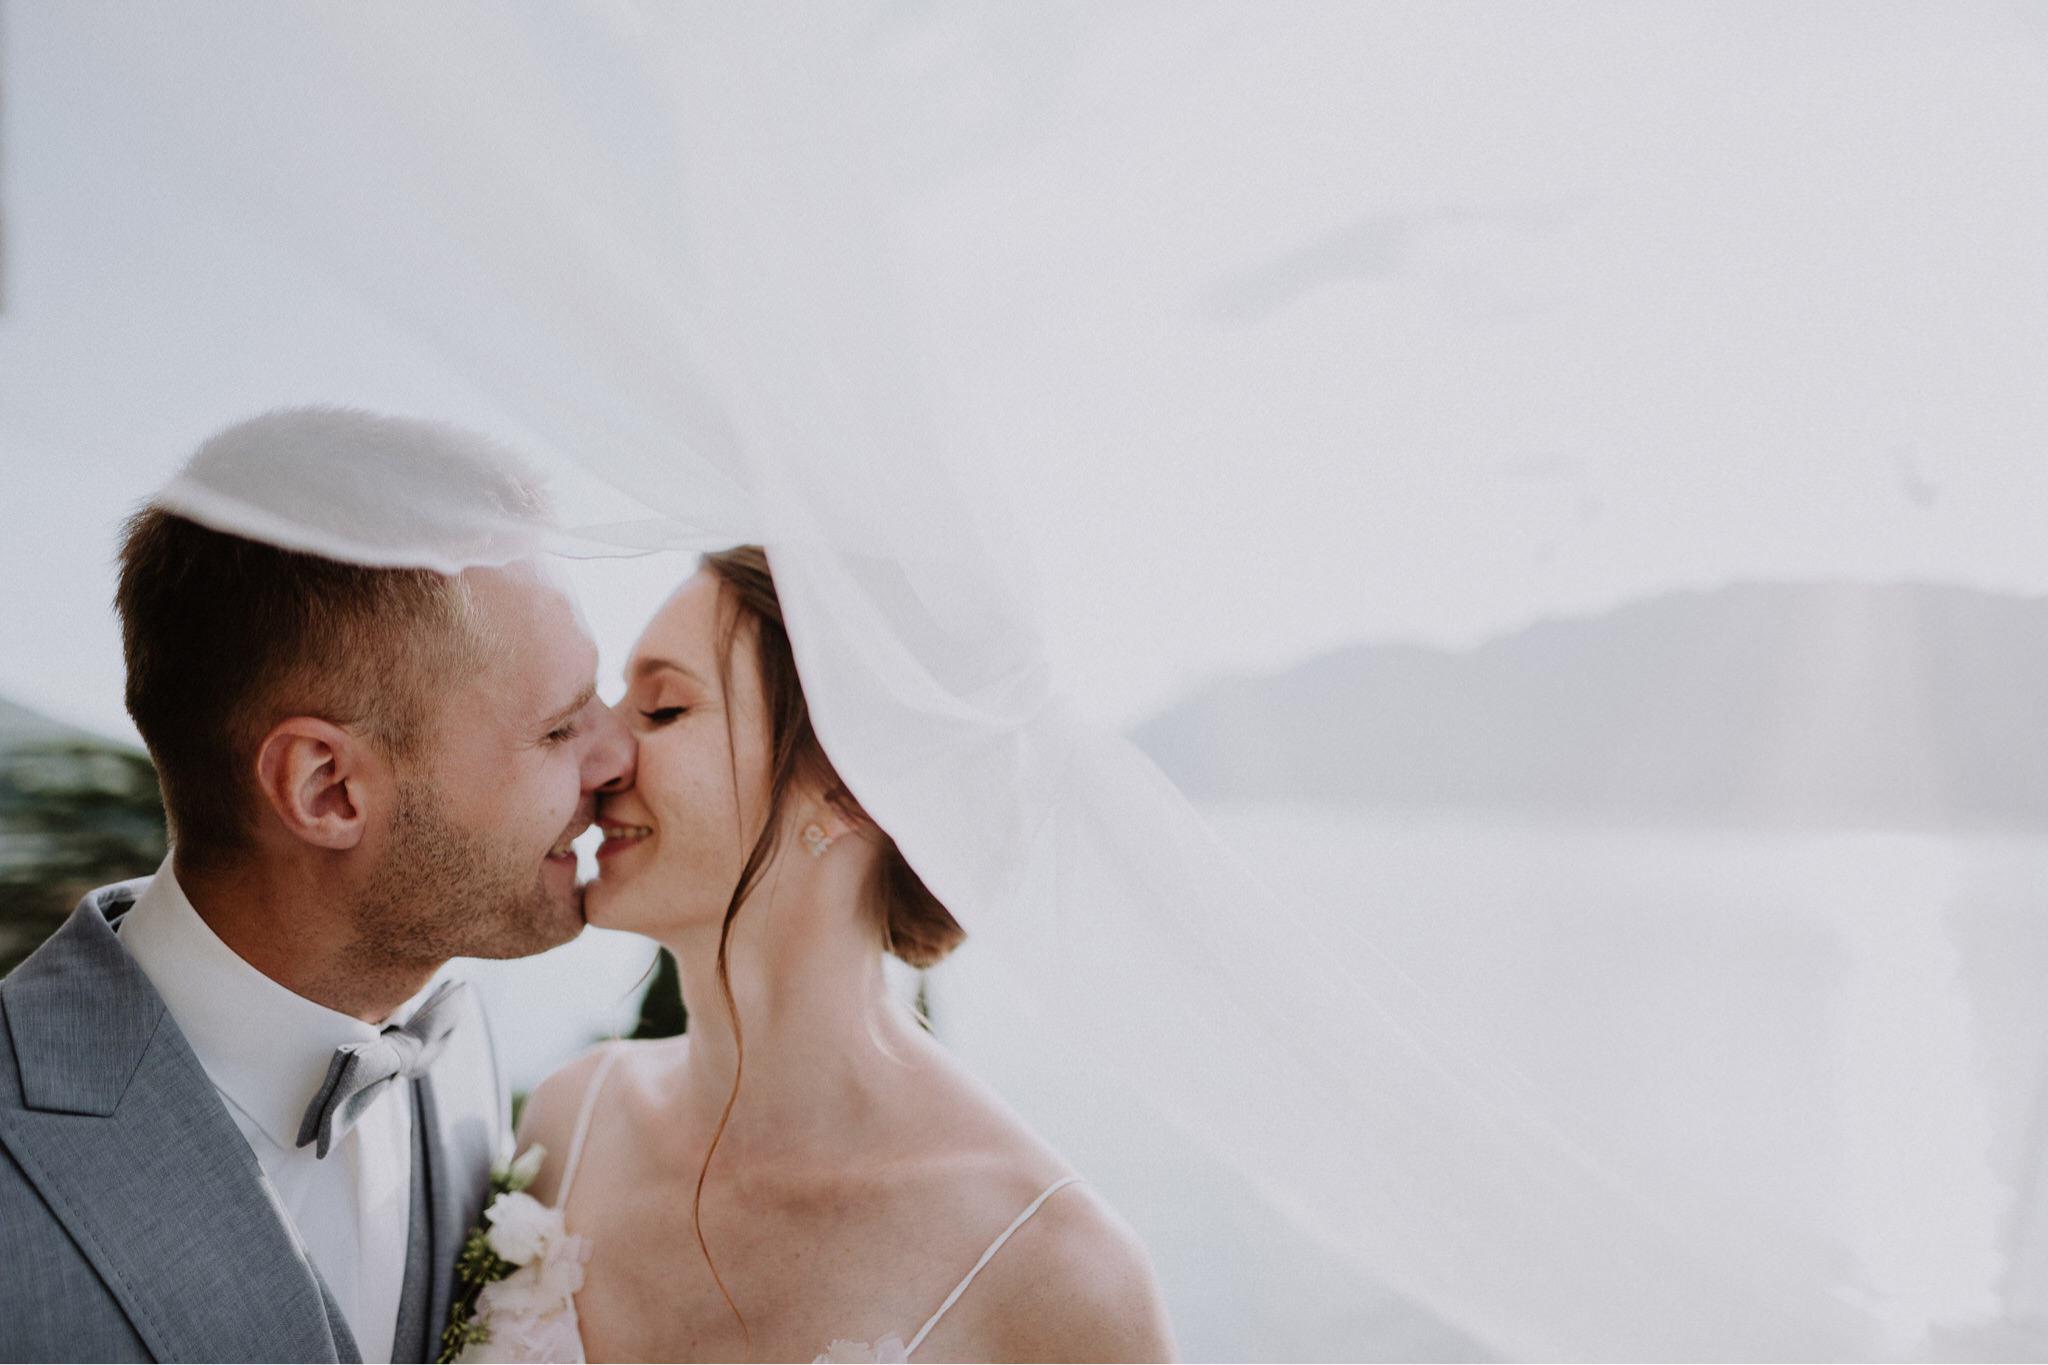 50 la 03 zeremonie 1269 weddinphotographer Hochzeitsfotograf newzealand hamilton Weddingphotography Stuttgart